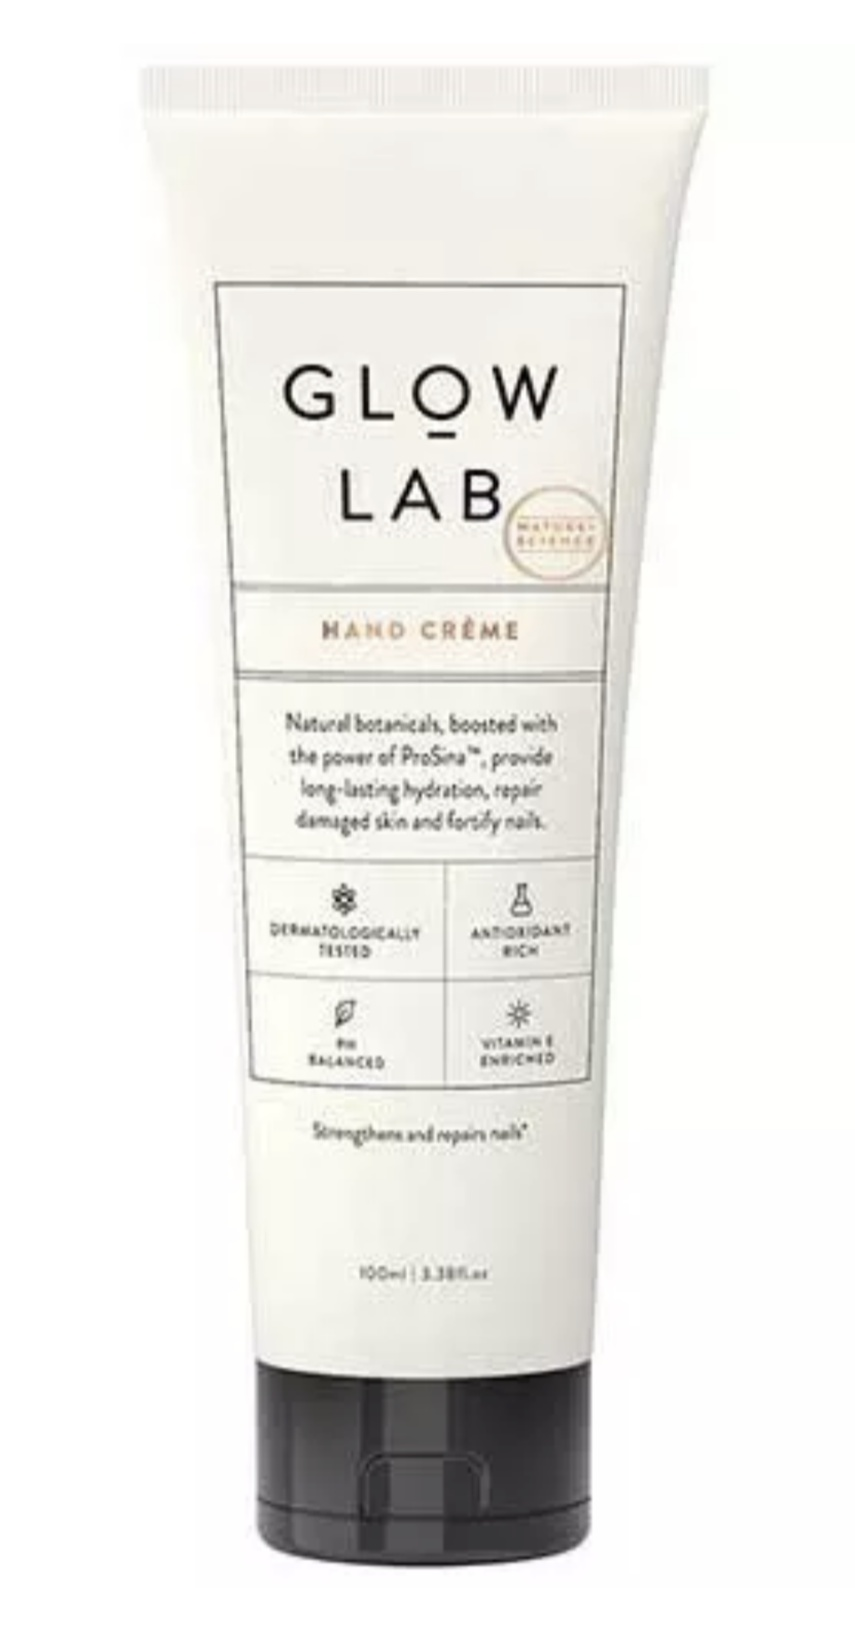 Glow Lab Hand Crème